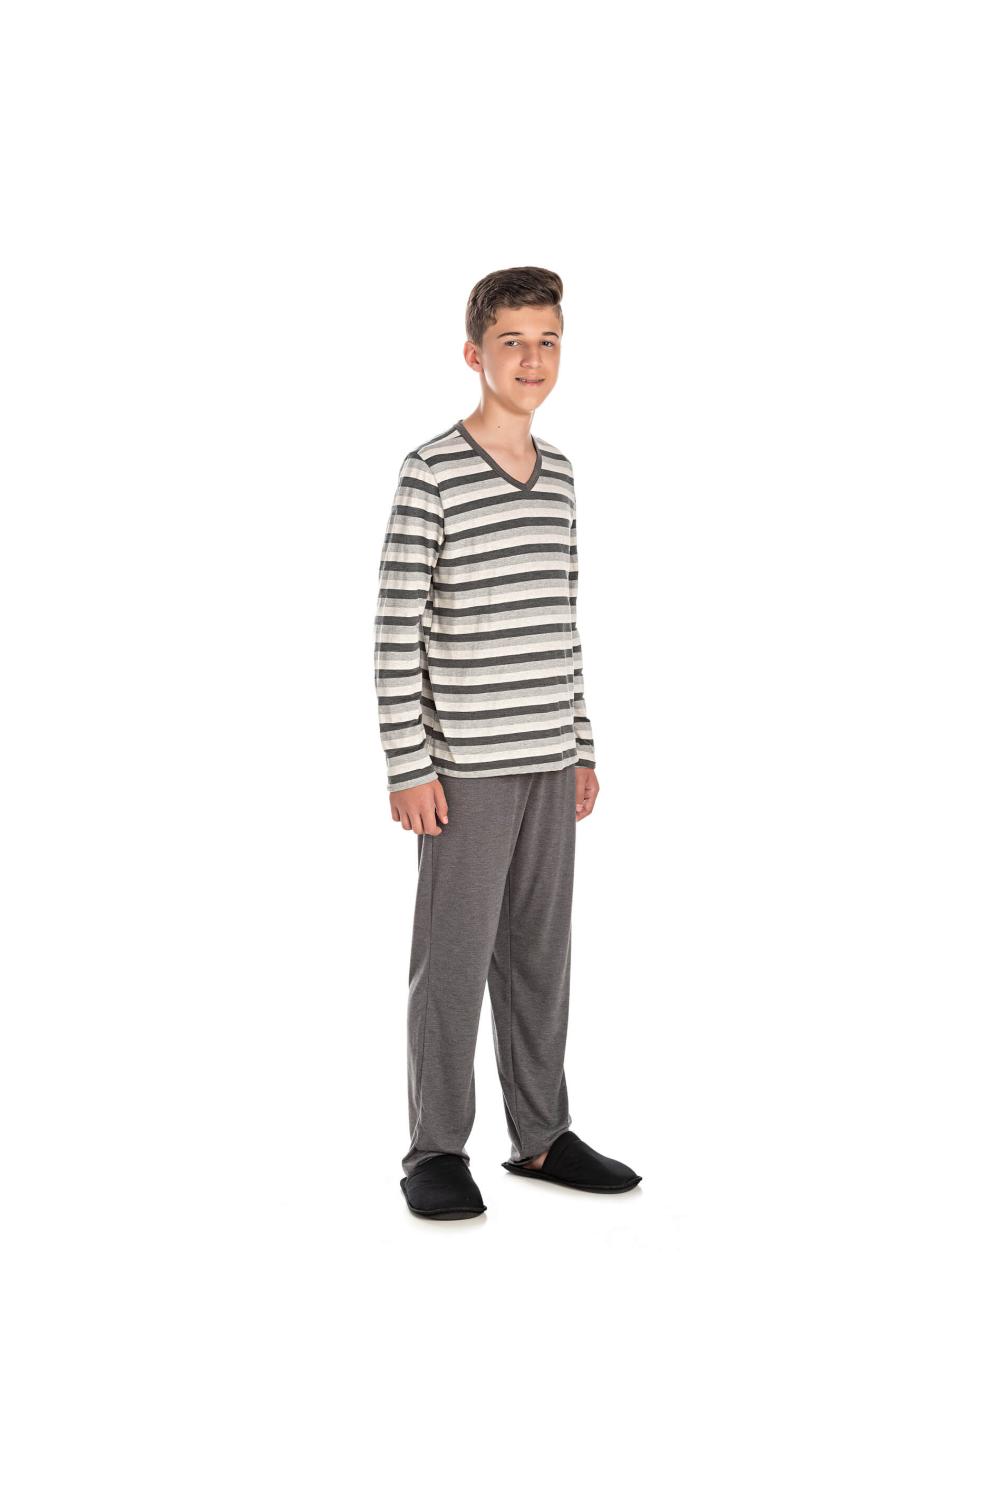 014/B - Pijama Juvenil Masculino Listrado